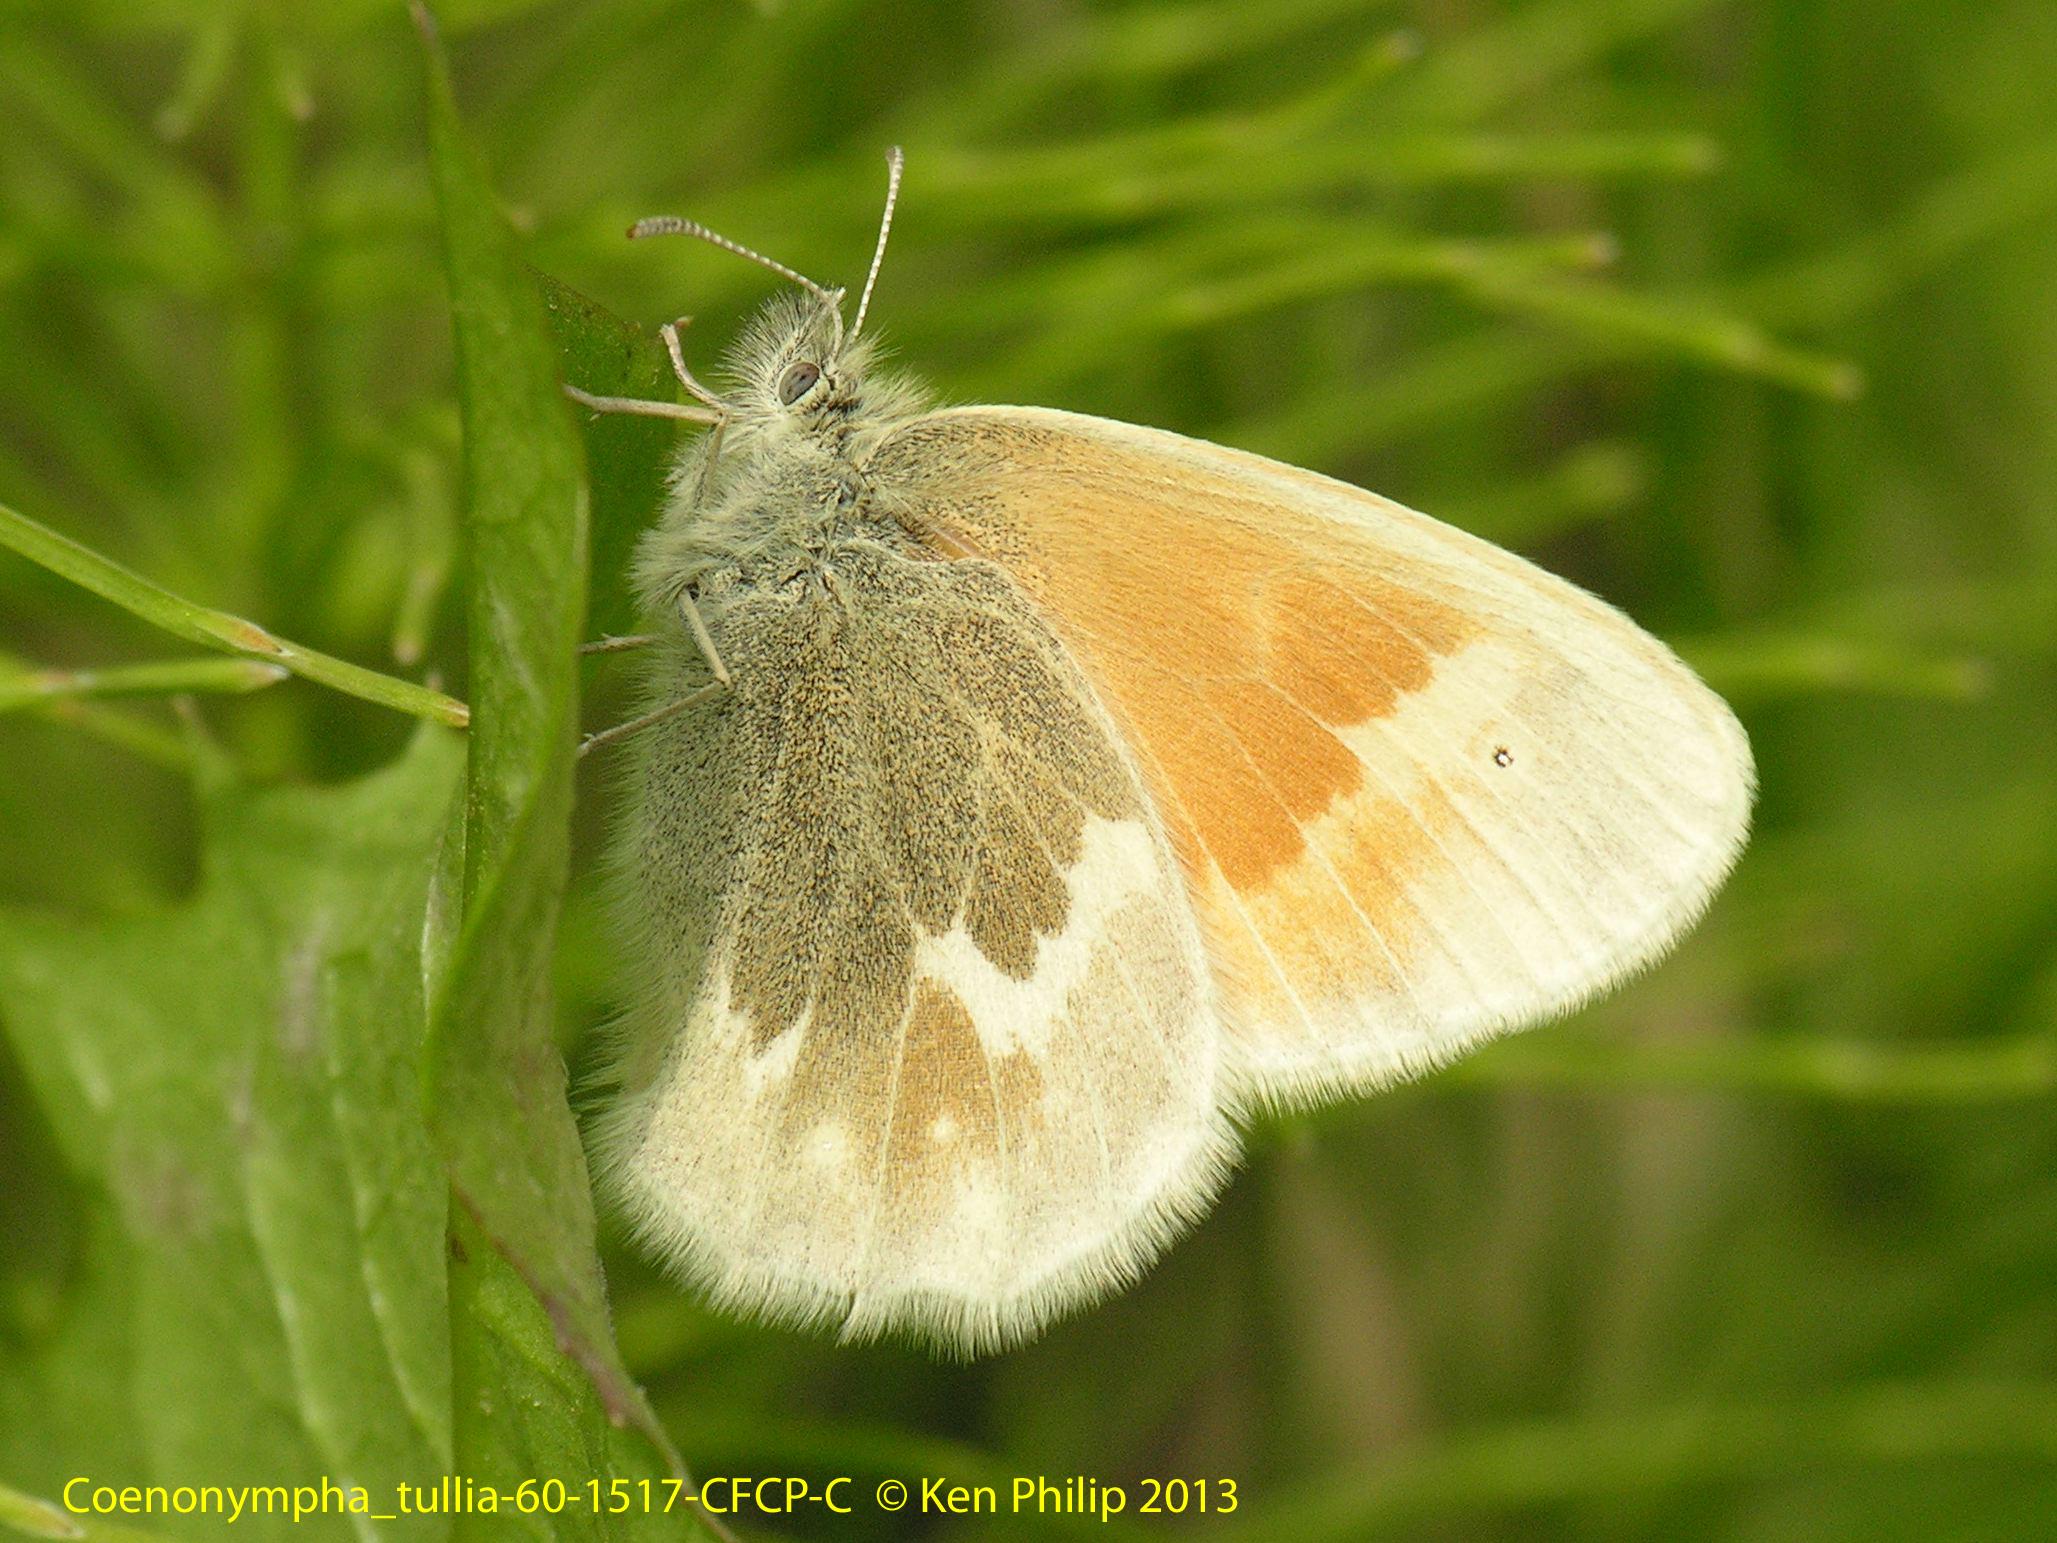 60-Coenonympha_tullia-60-1517-CFCP-C._kodiak